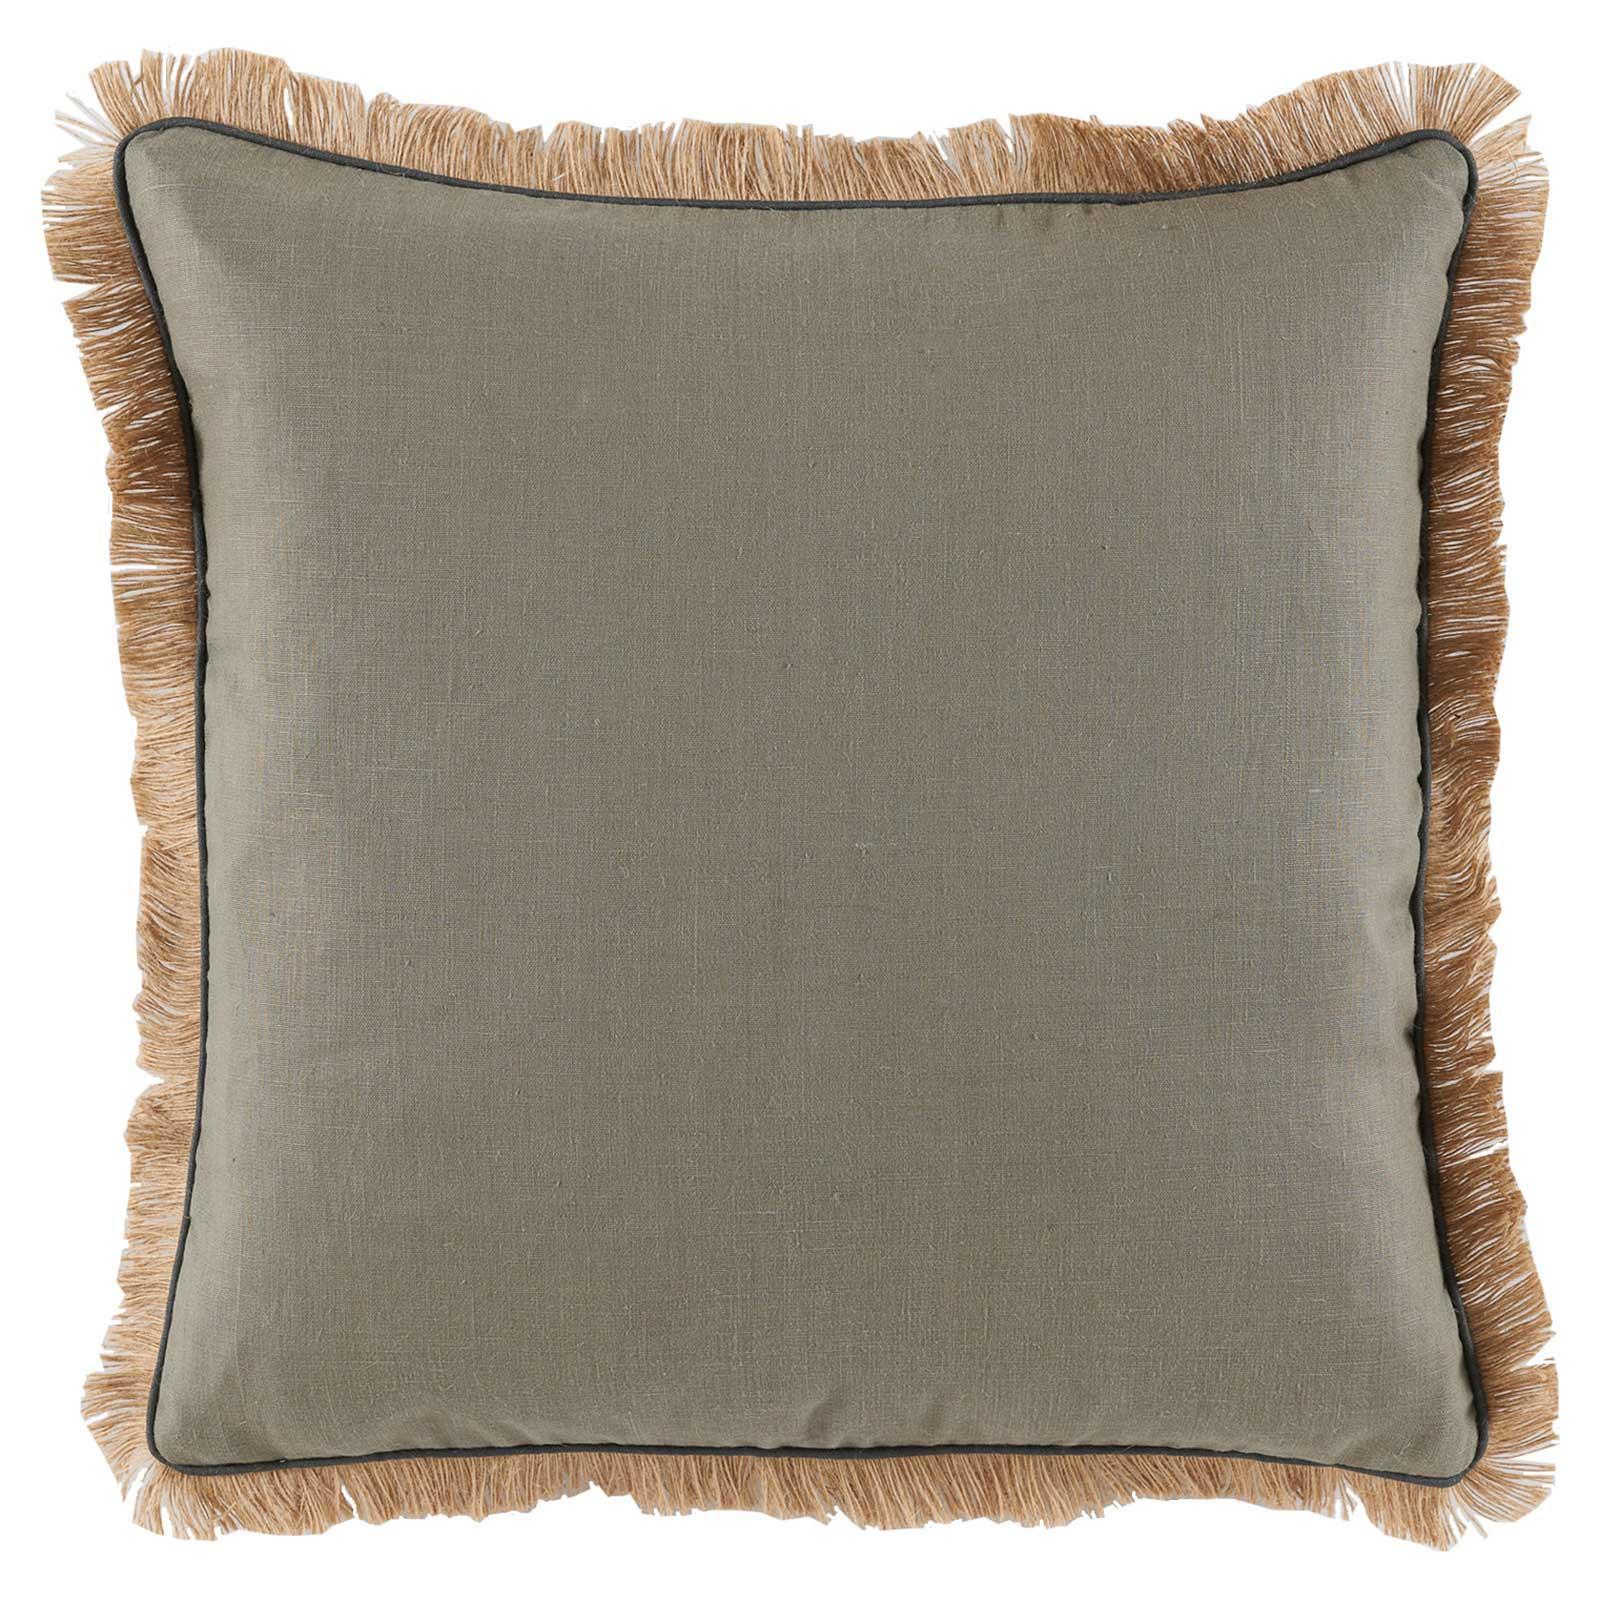 Mamie Modern Pipe Fringe Grey Linen Pillow - 24x24